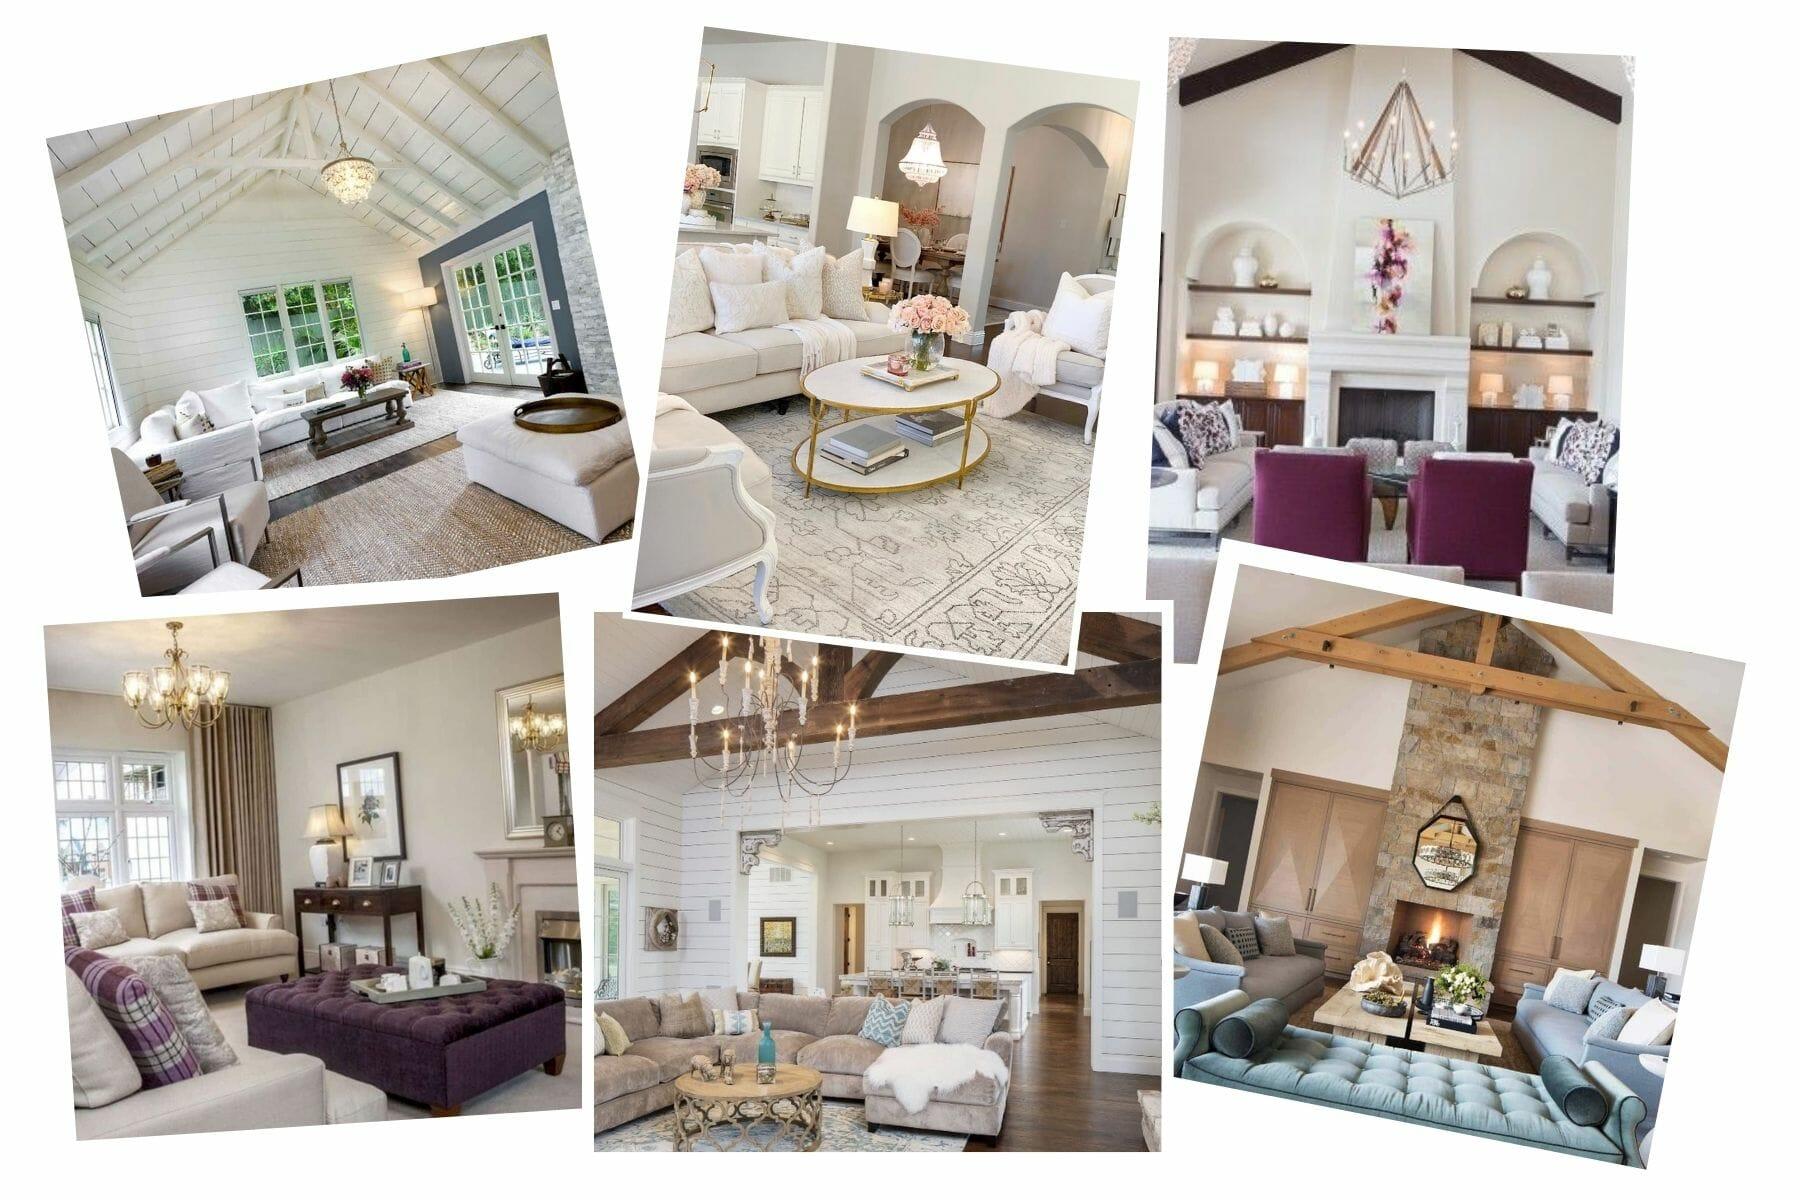 Rustic glam living room moodboard